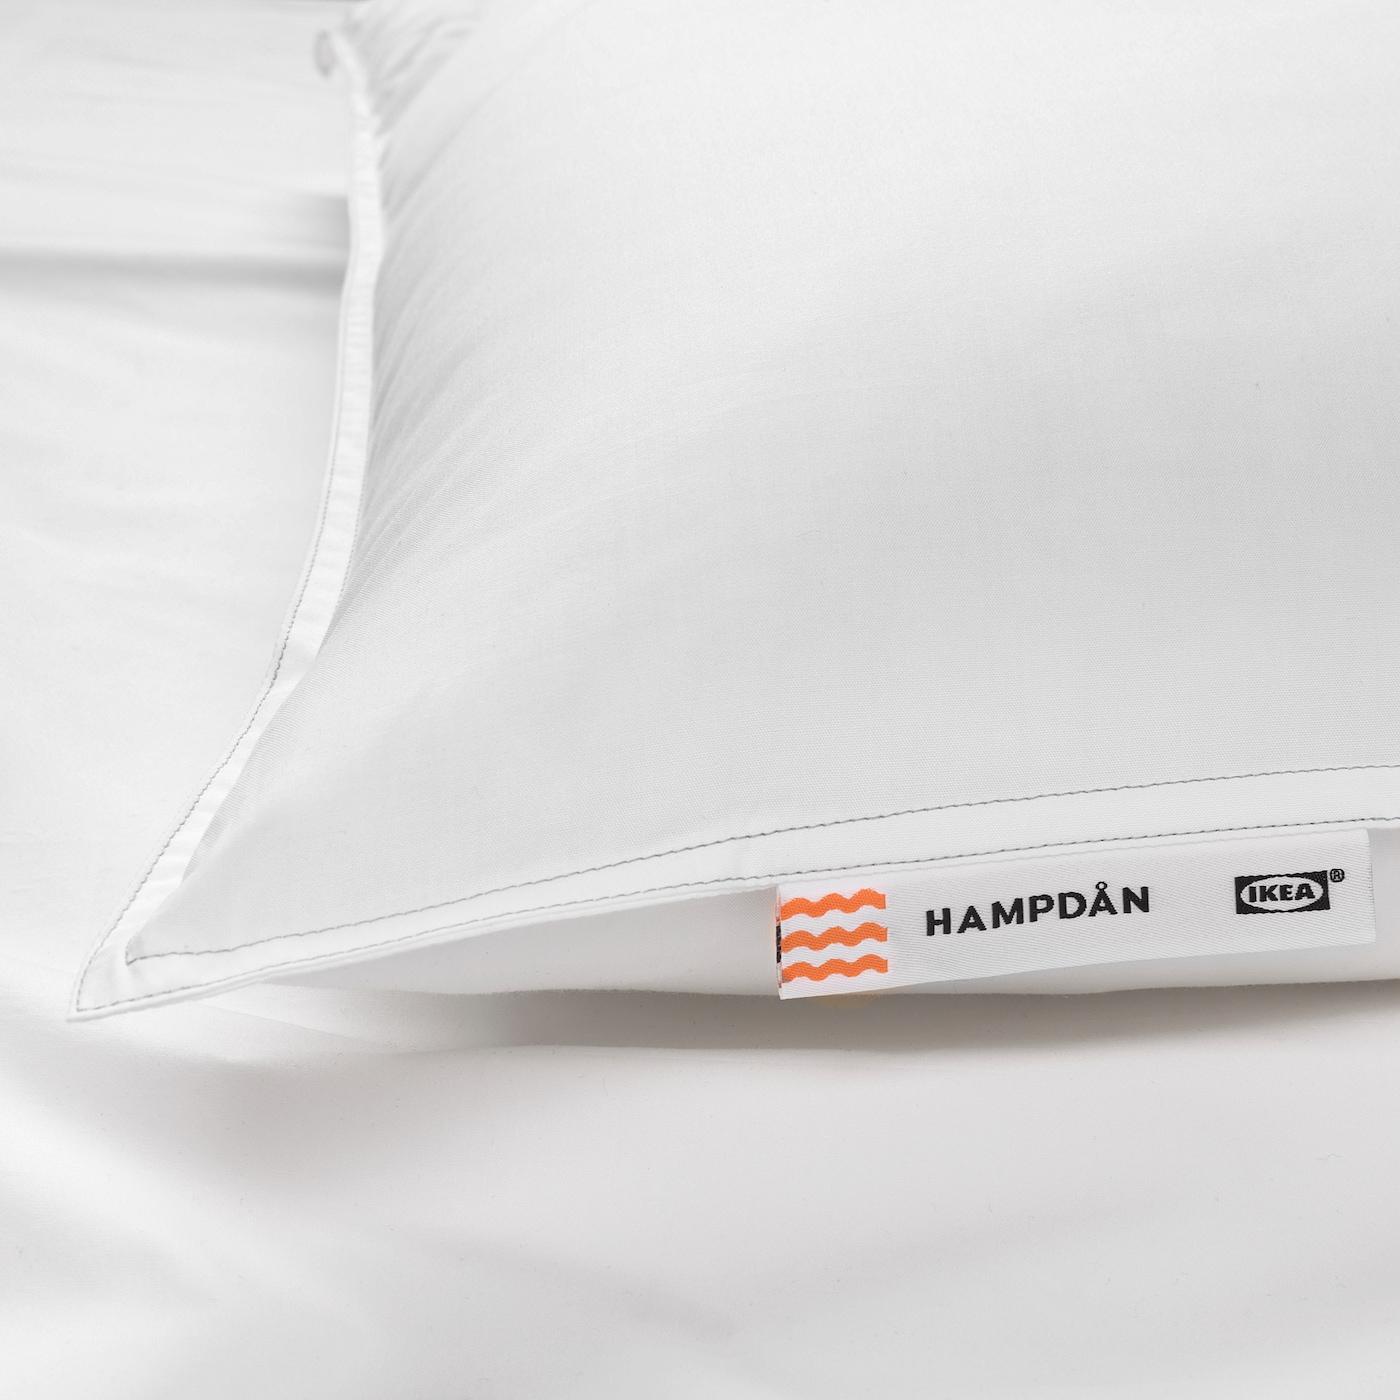 Ikea Cuscino Gosa Vadd.Hampdan Cuscino Morbido Bianco Ikea Svizzera